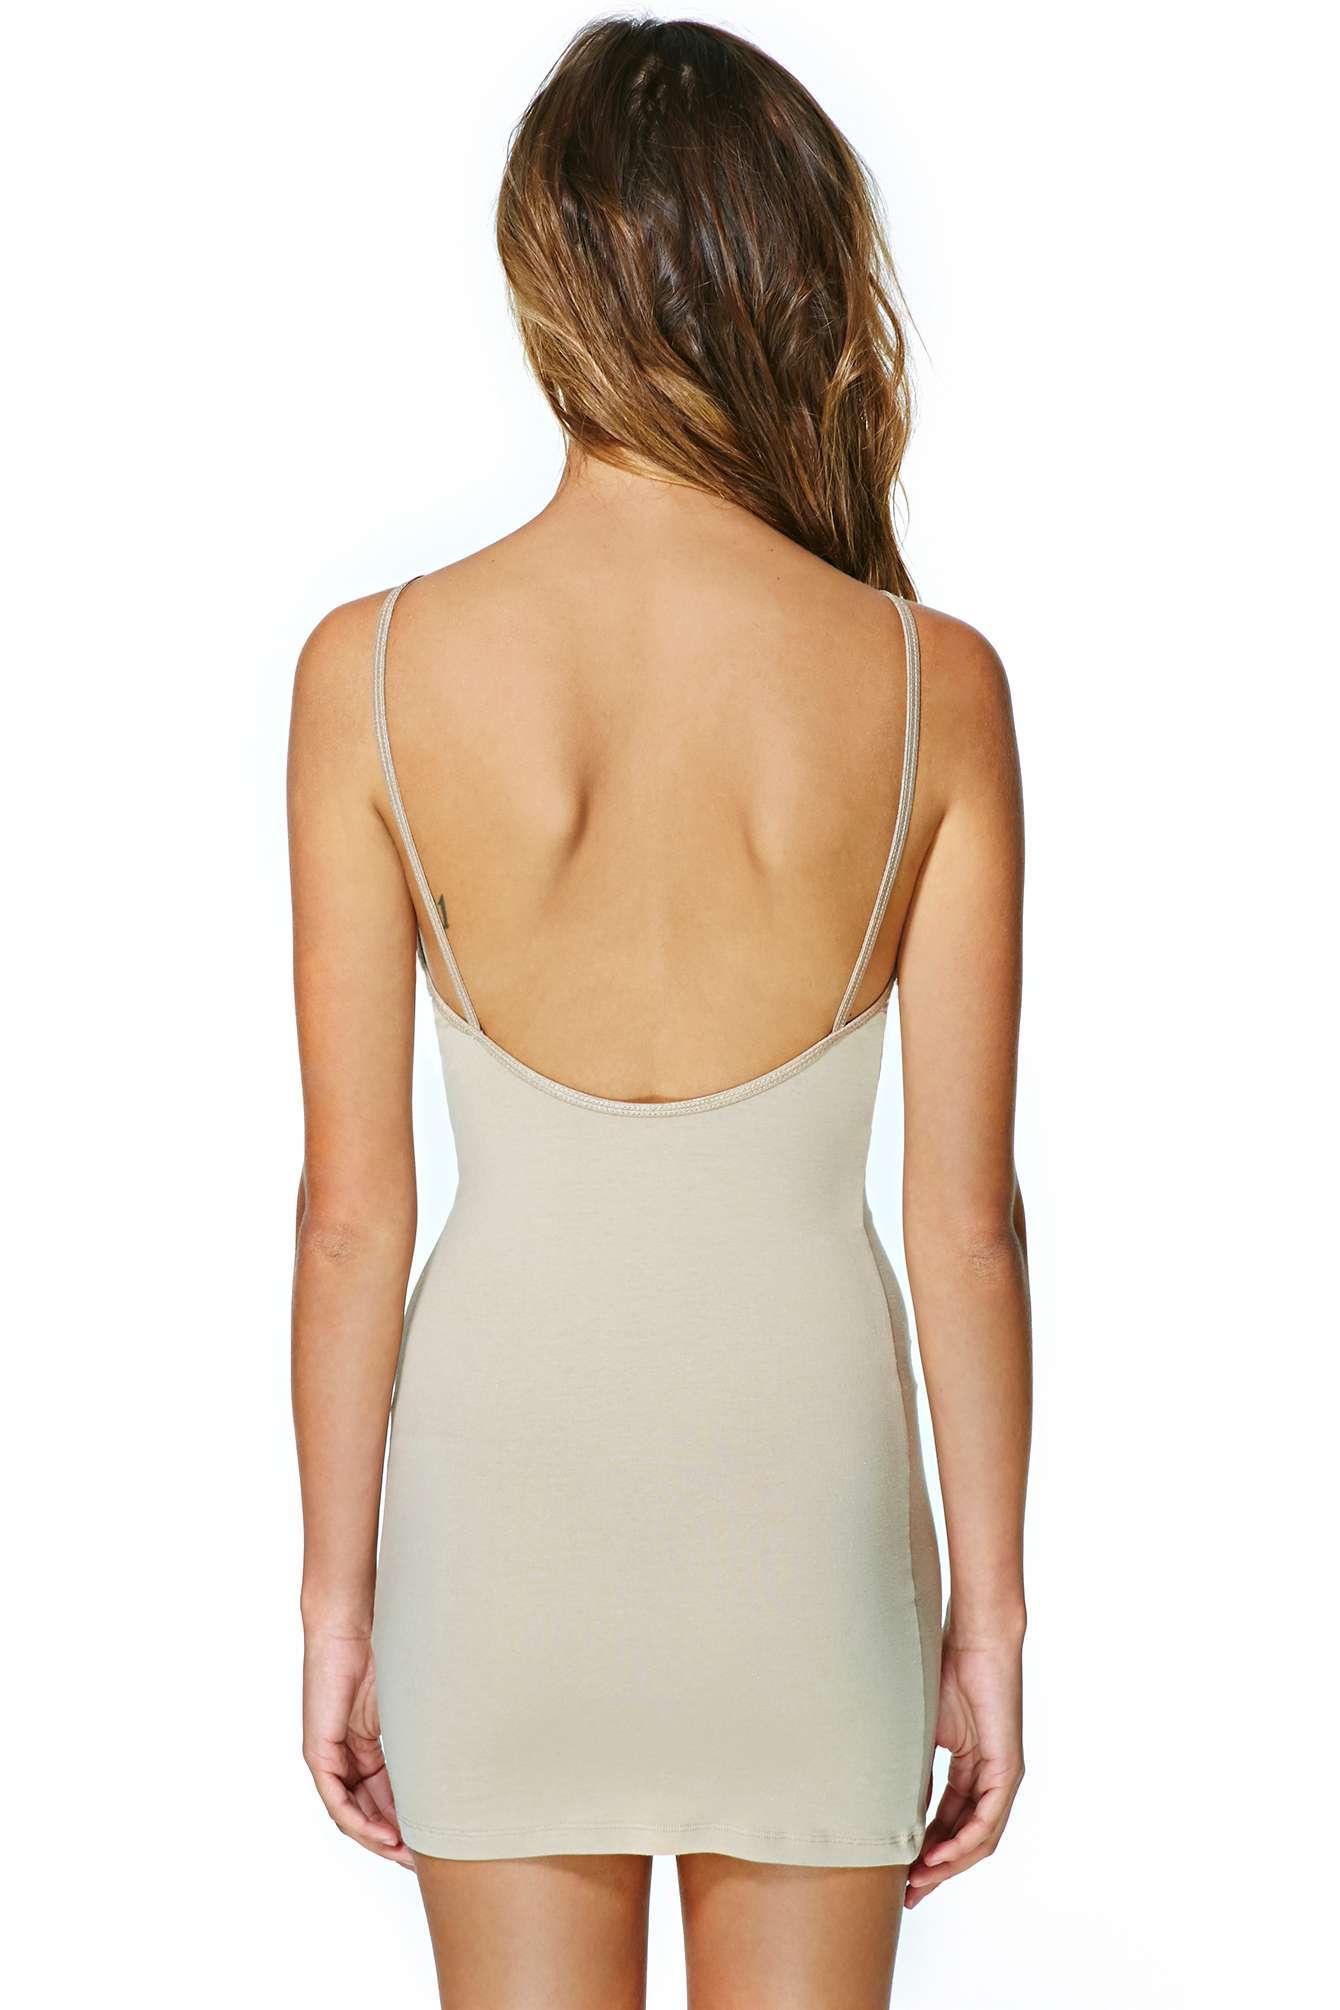 Lyst - Nasty Gal Basic Slip Dress - Nude In White-5271